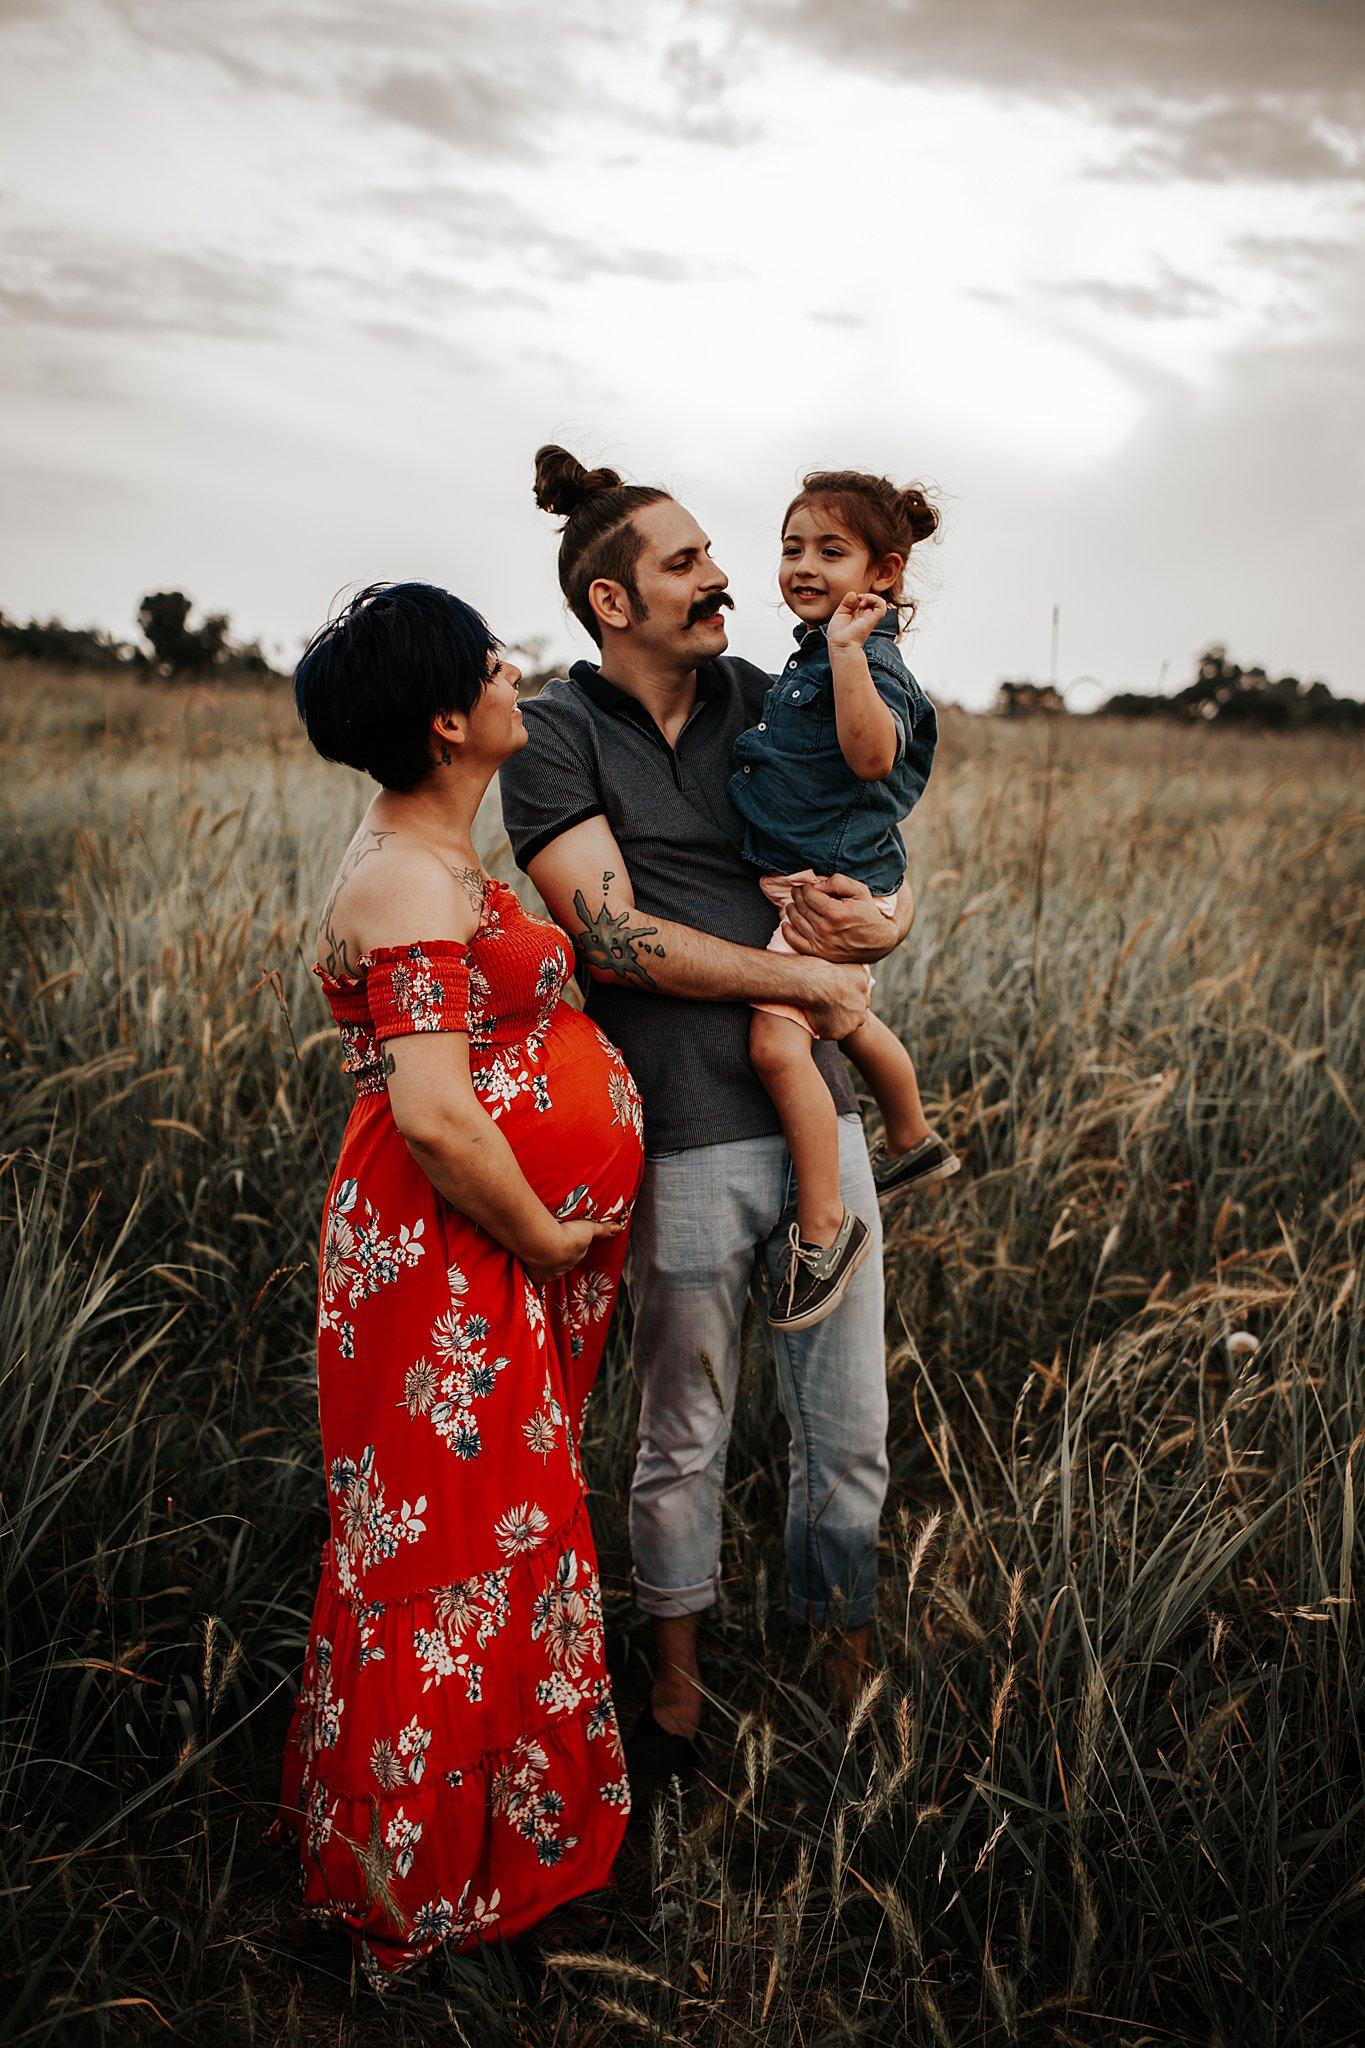 Meagan-San-Antonio-Maternity-Photographer-60_WEB.jpg